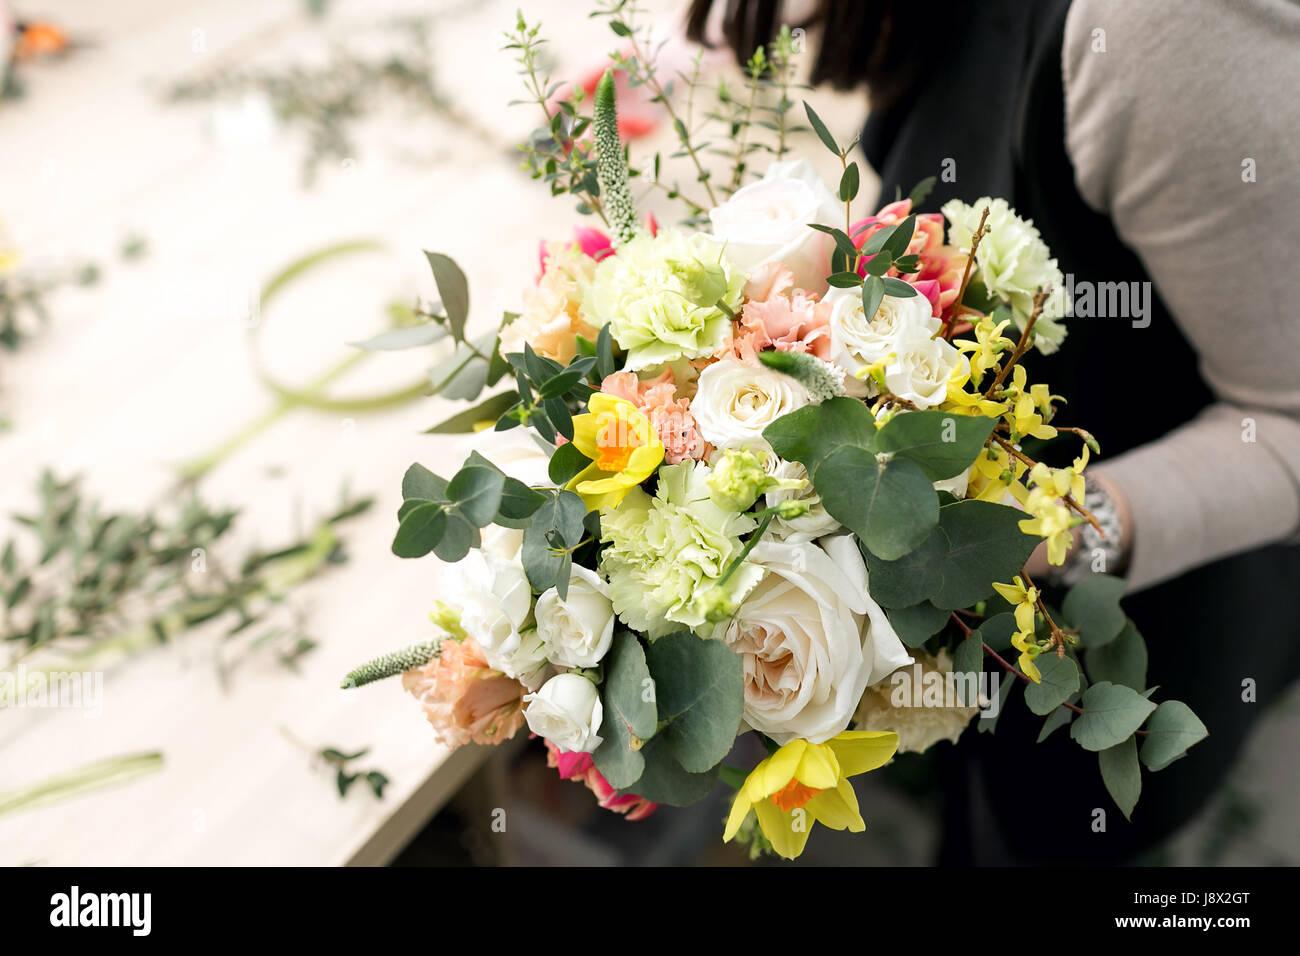 Workshop florist making bouquets and flower arrangements woman workshop florist making bouquets and flower arrangements woman collecting a bouquet of flowers soft focus izmirmasajfo